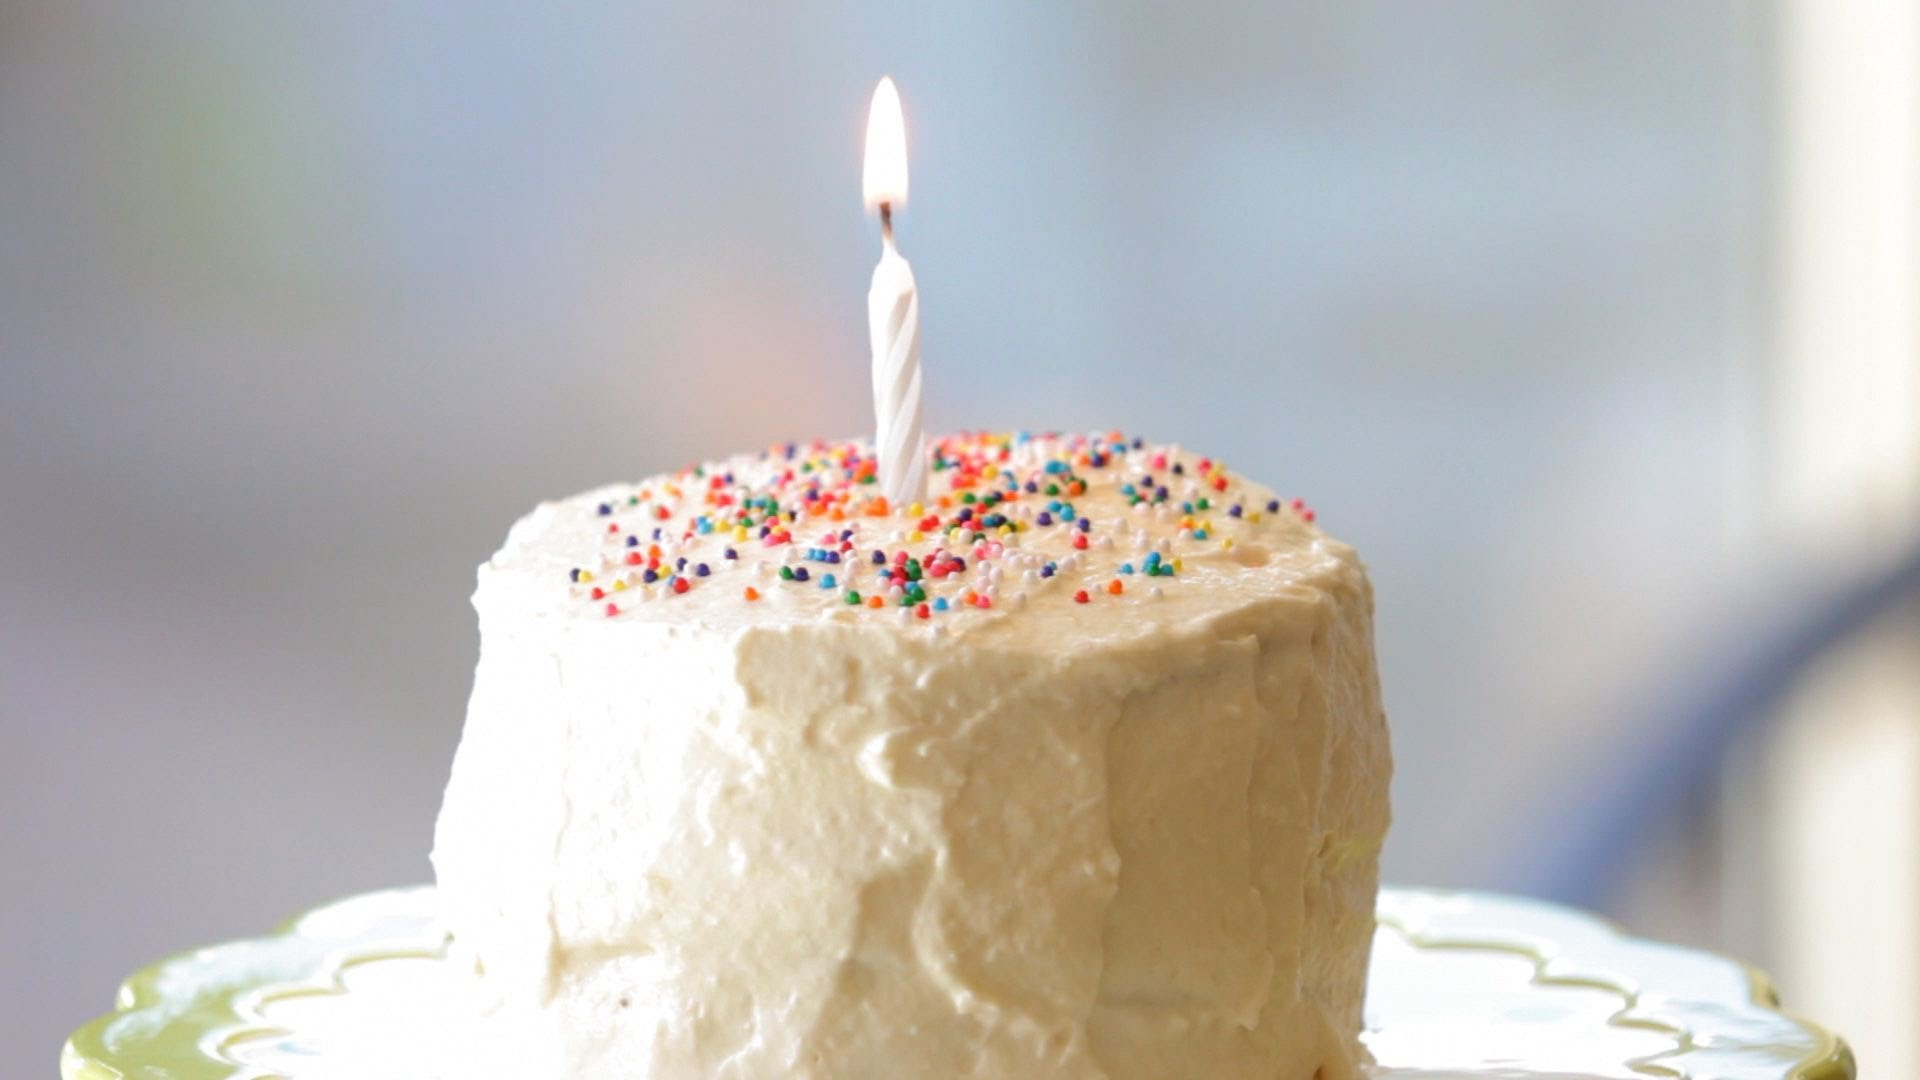 Prvi rođendan